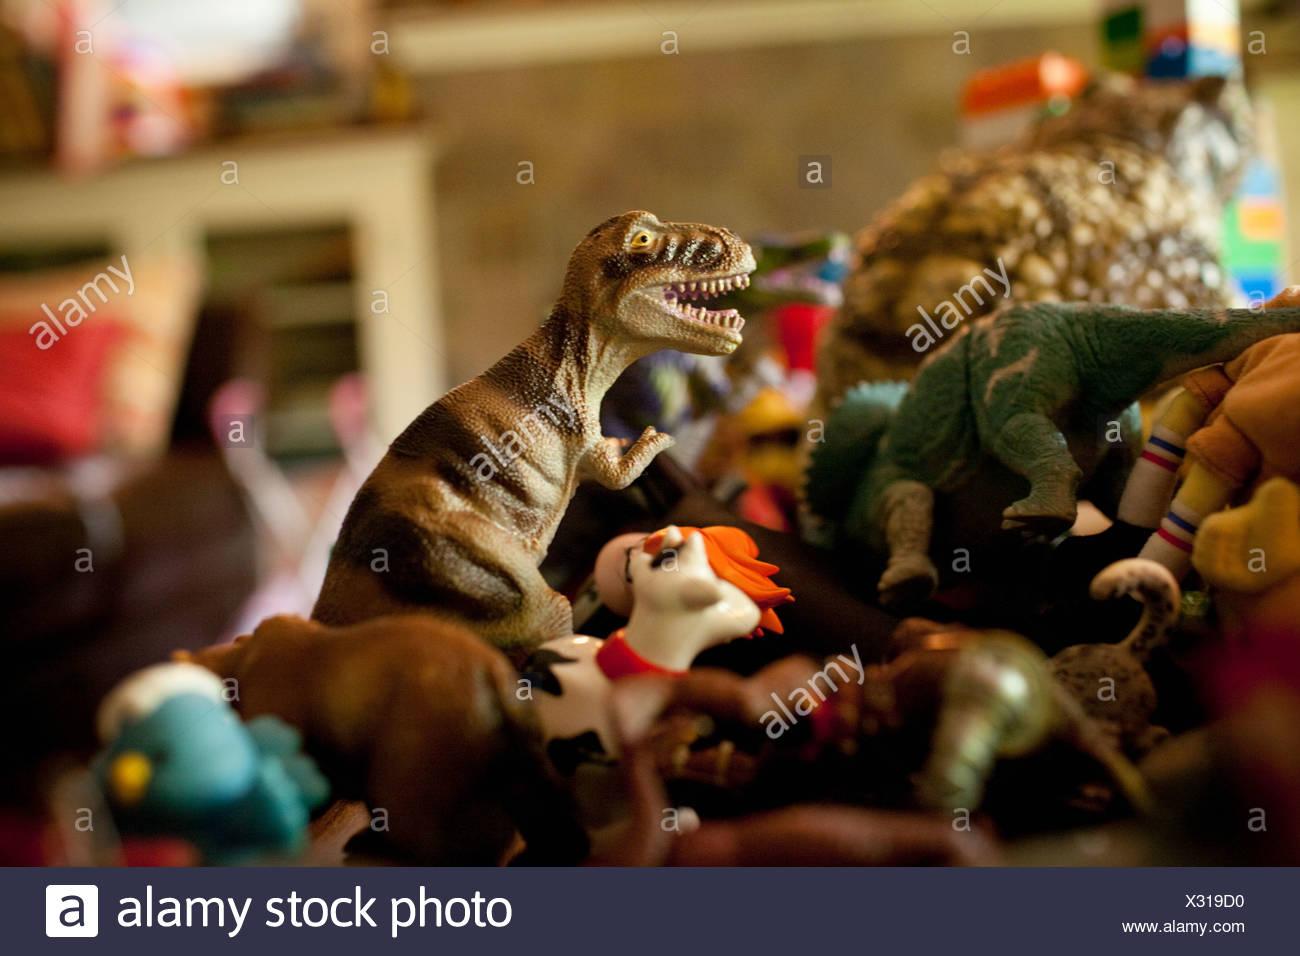 Childhood toys, close up - Stock Image